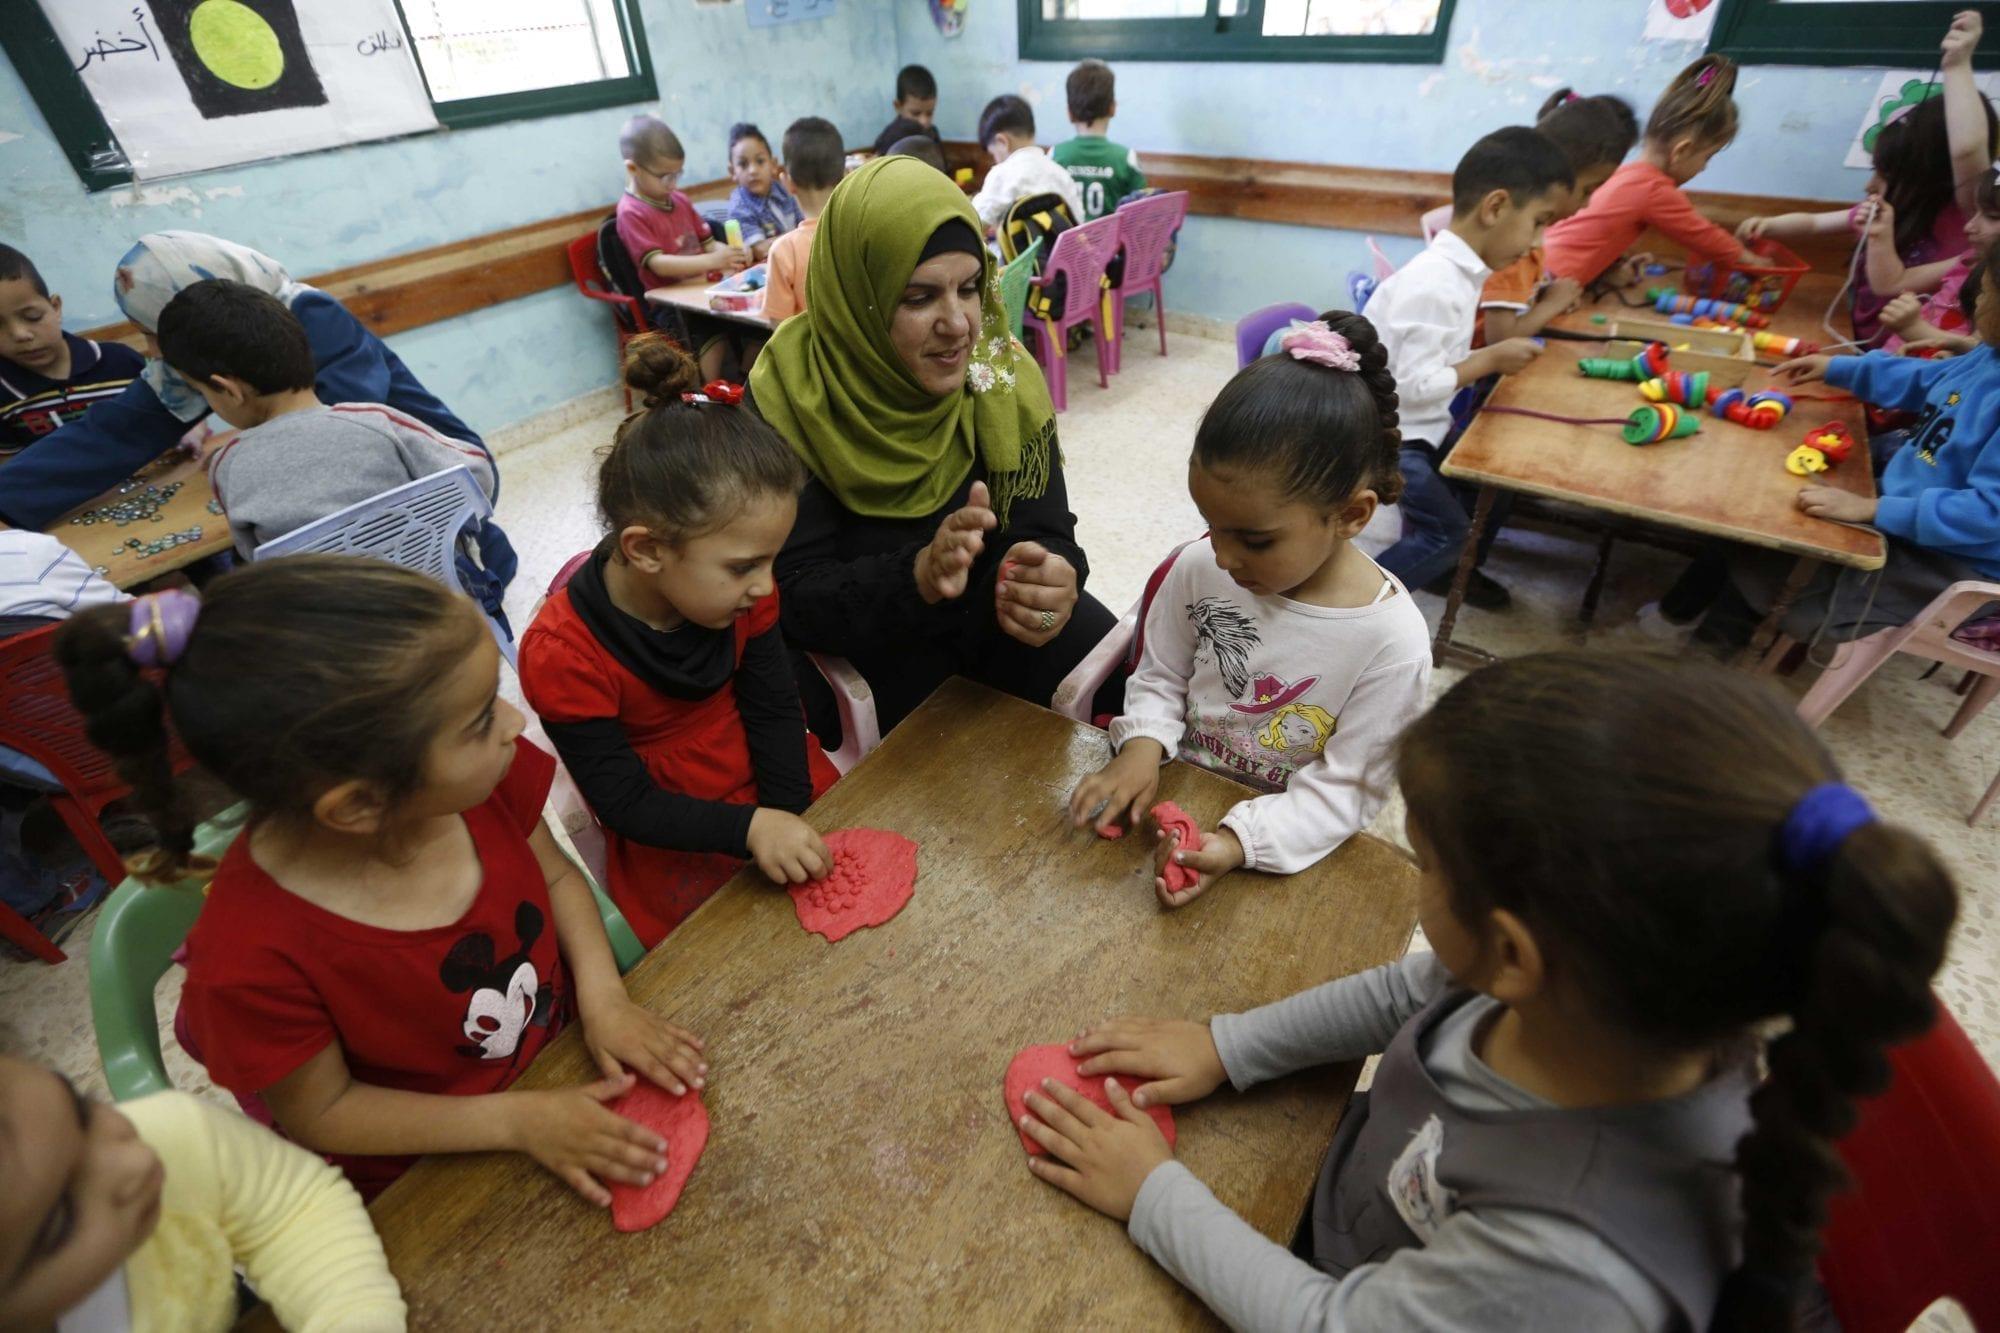 Palestine, unions, decent work, teacher, Solidarity Center